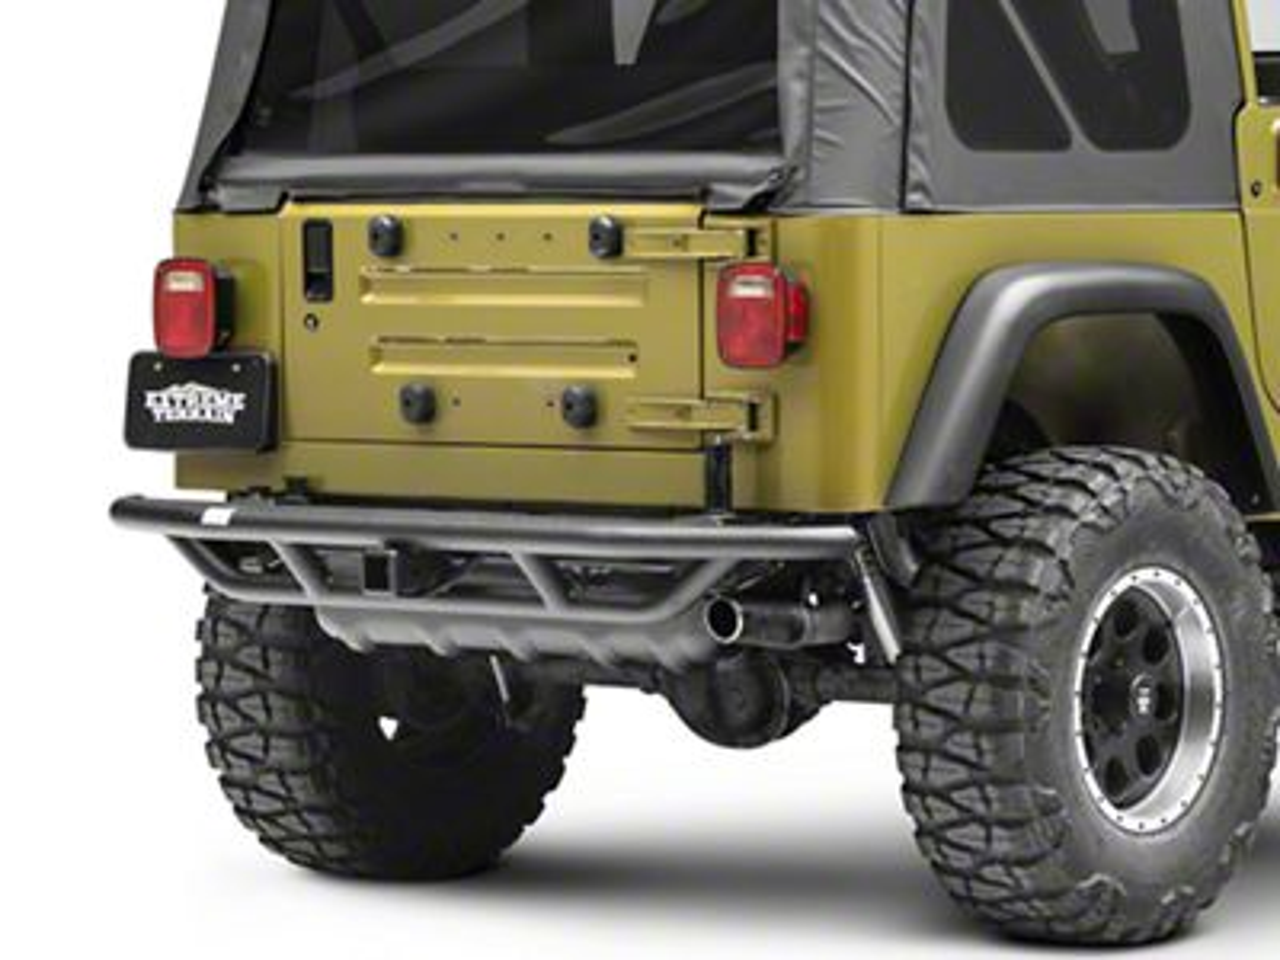 Smittybilt SRC Rear Bumper w/ Hitch (87-06 Jeep Wrangler YJ & TJ)